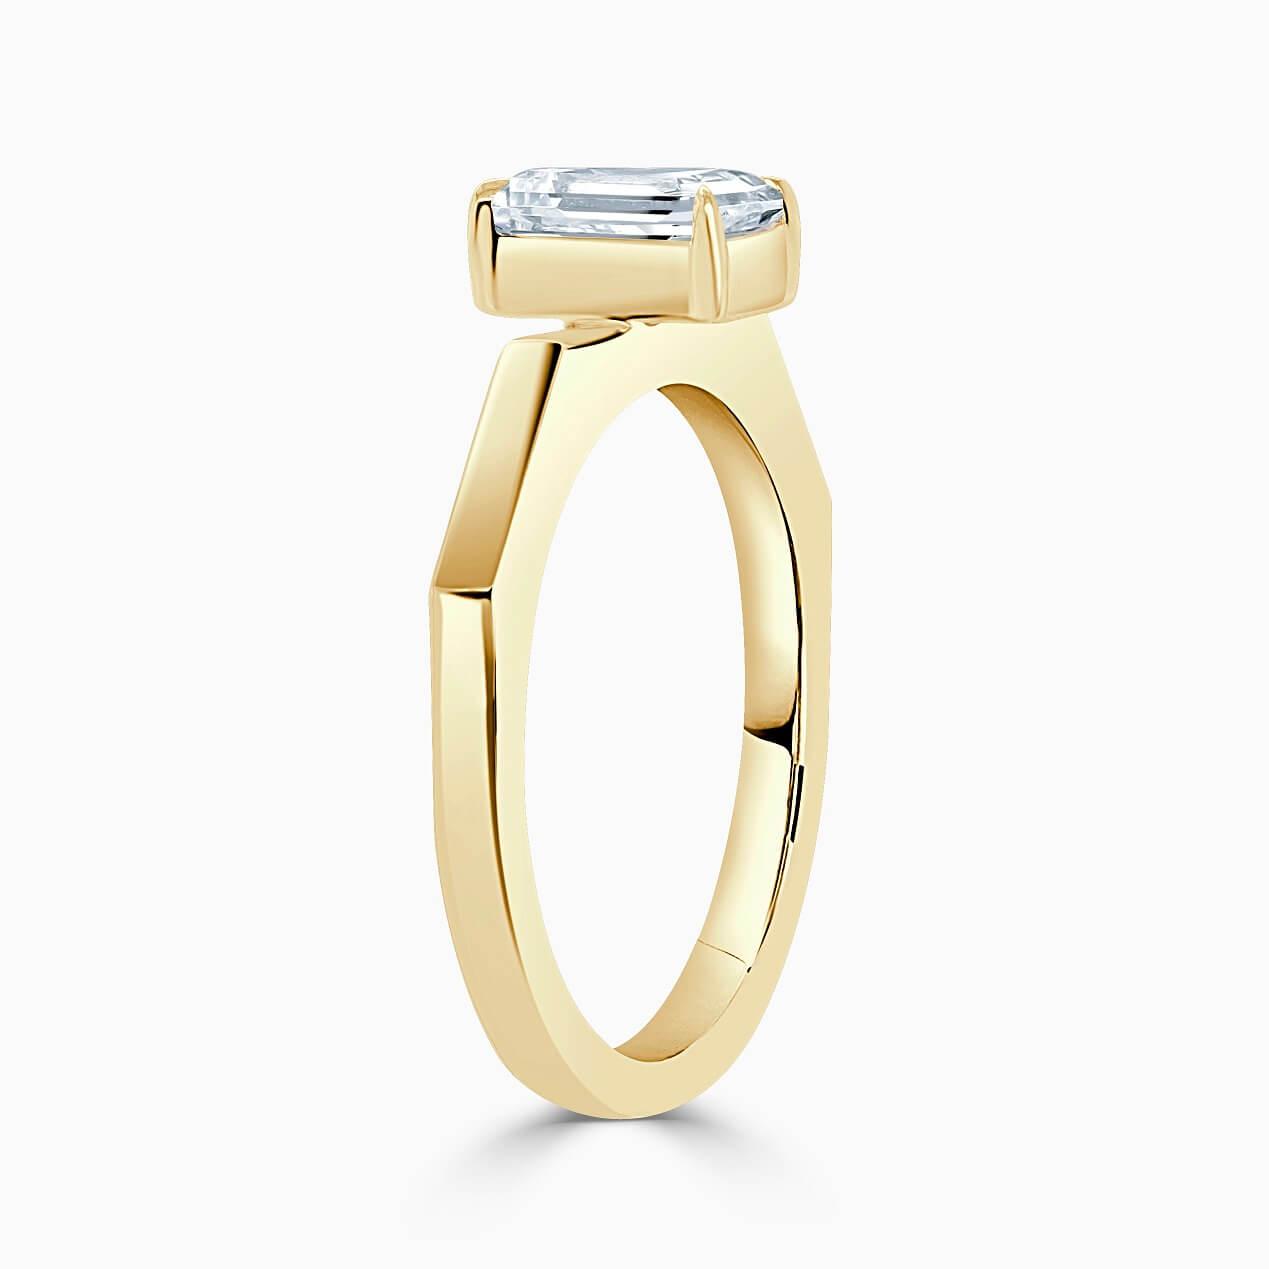 18ct Yellow Gold Radiant Cut Geometric Engagement Ring